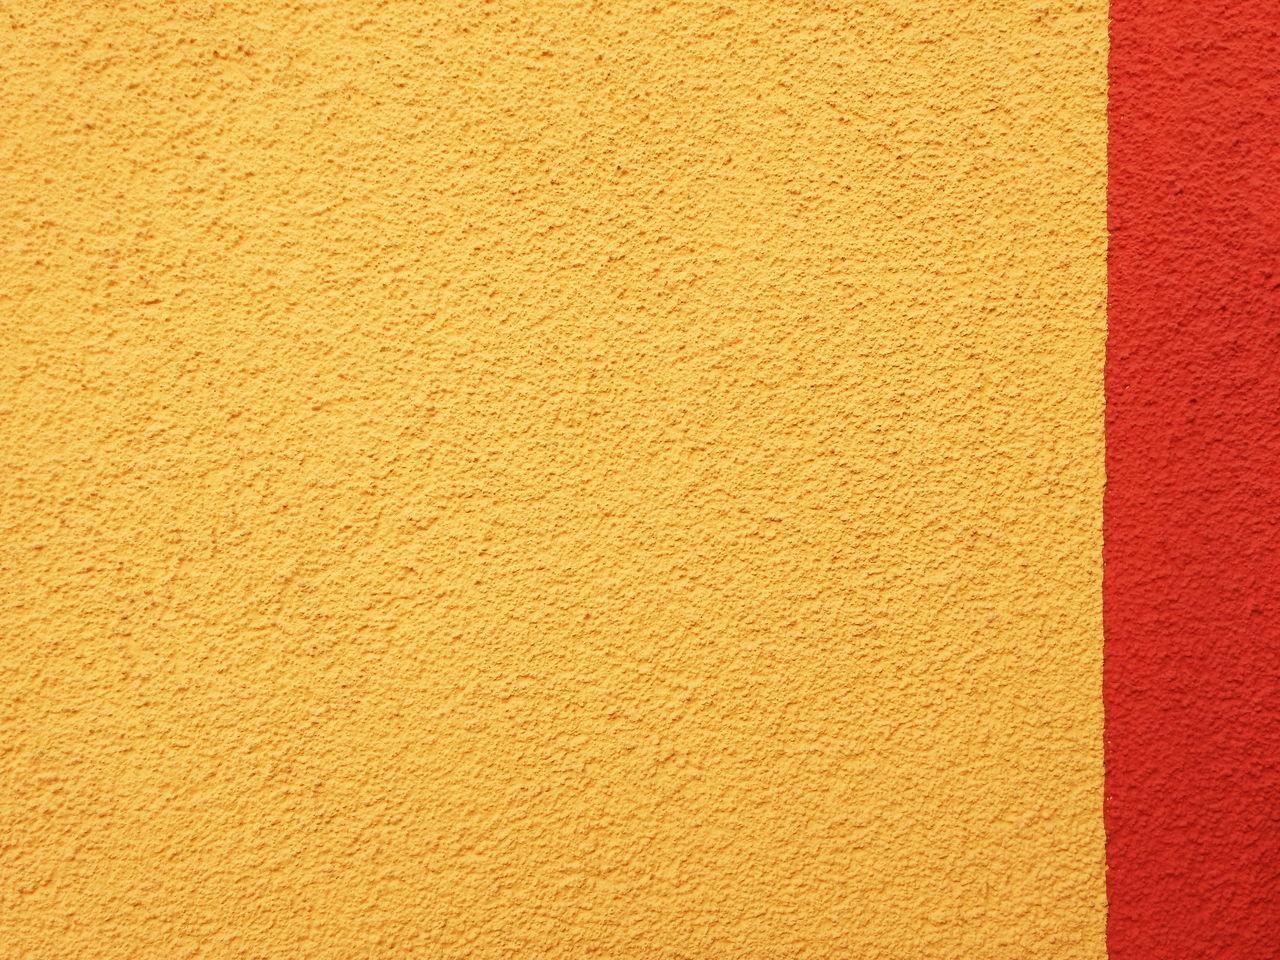 Abstract Façade Minimalism Simplicity Colors Textured